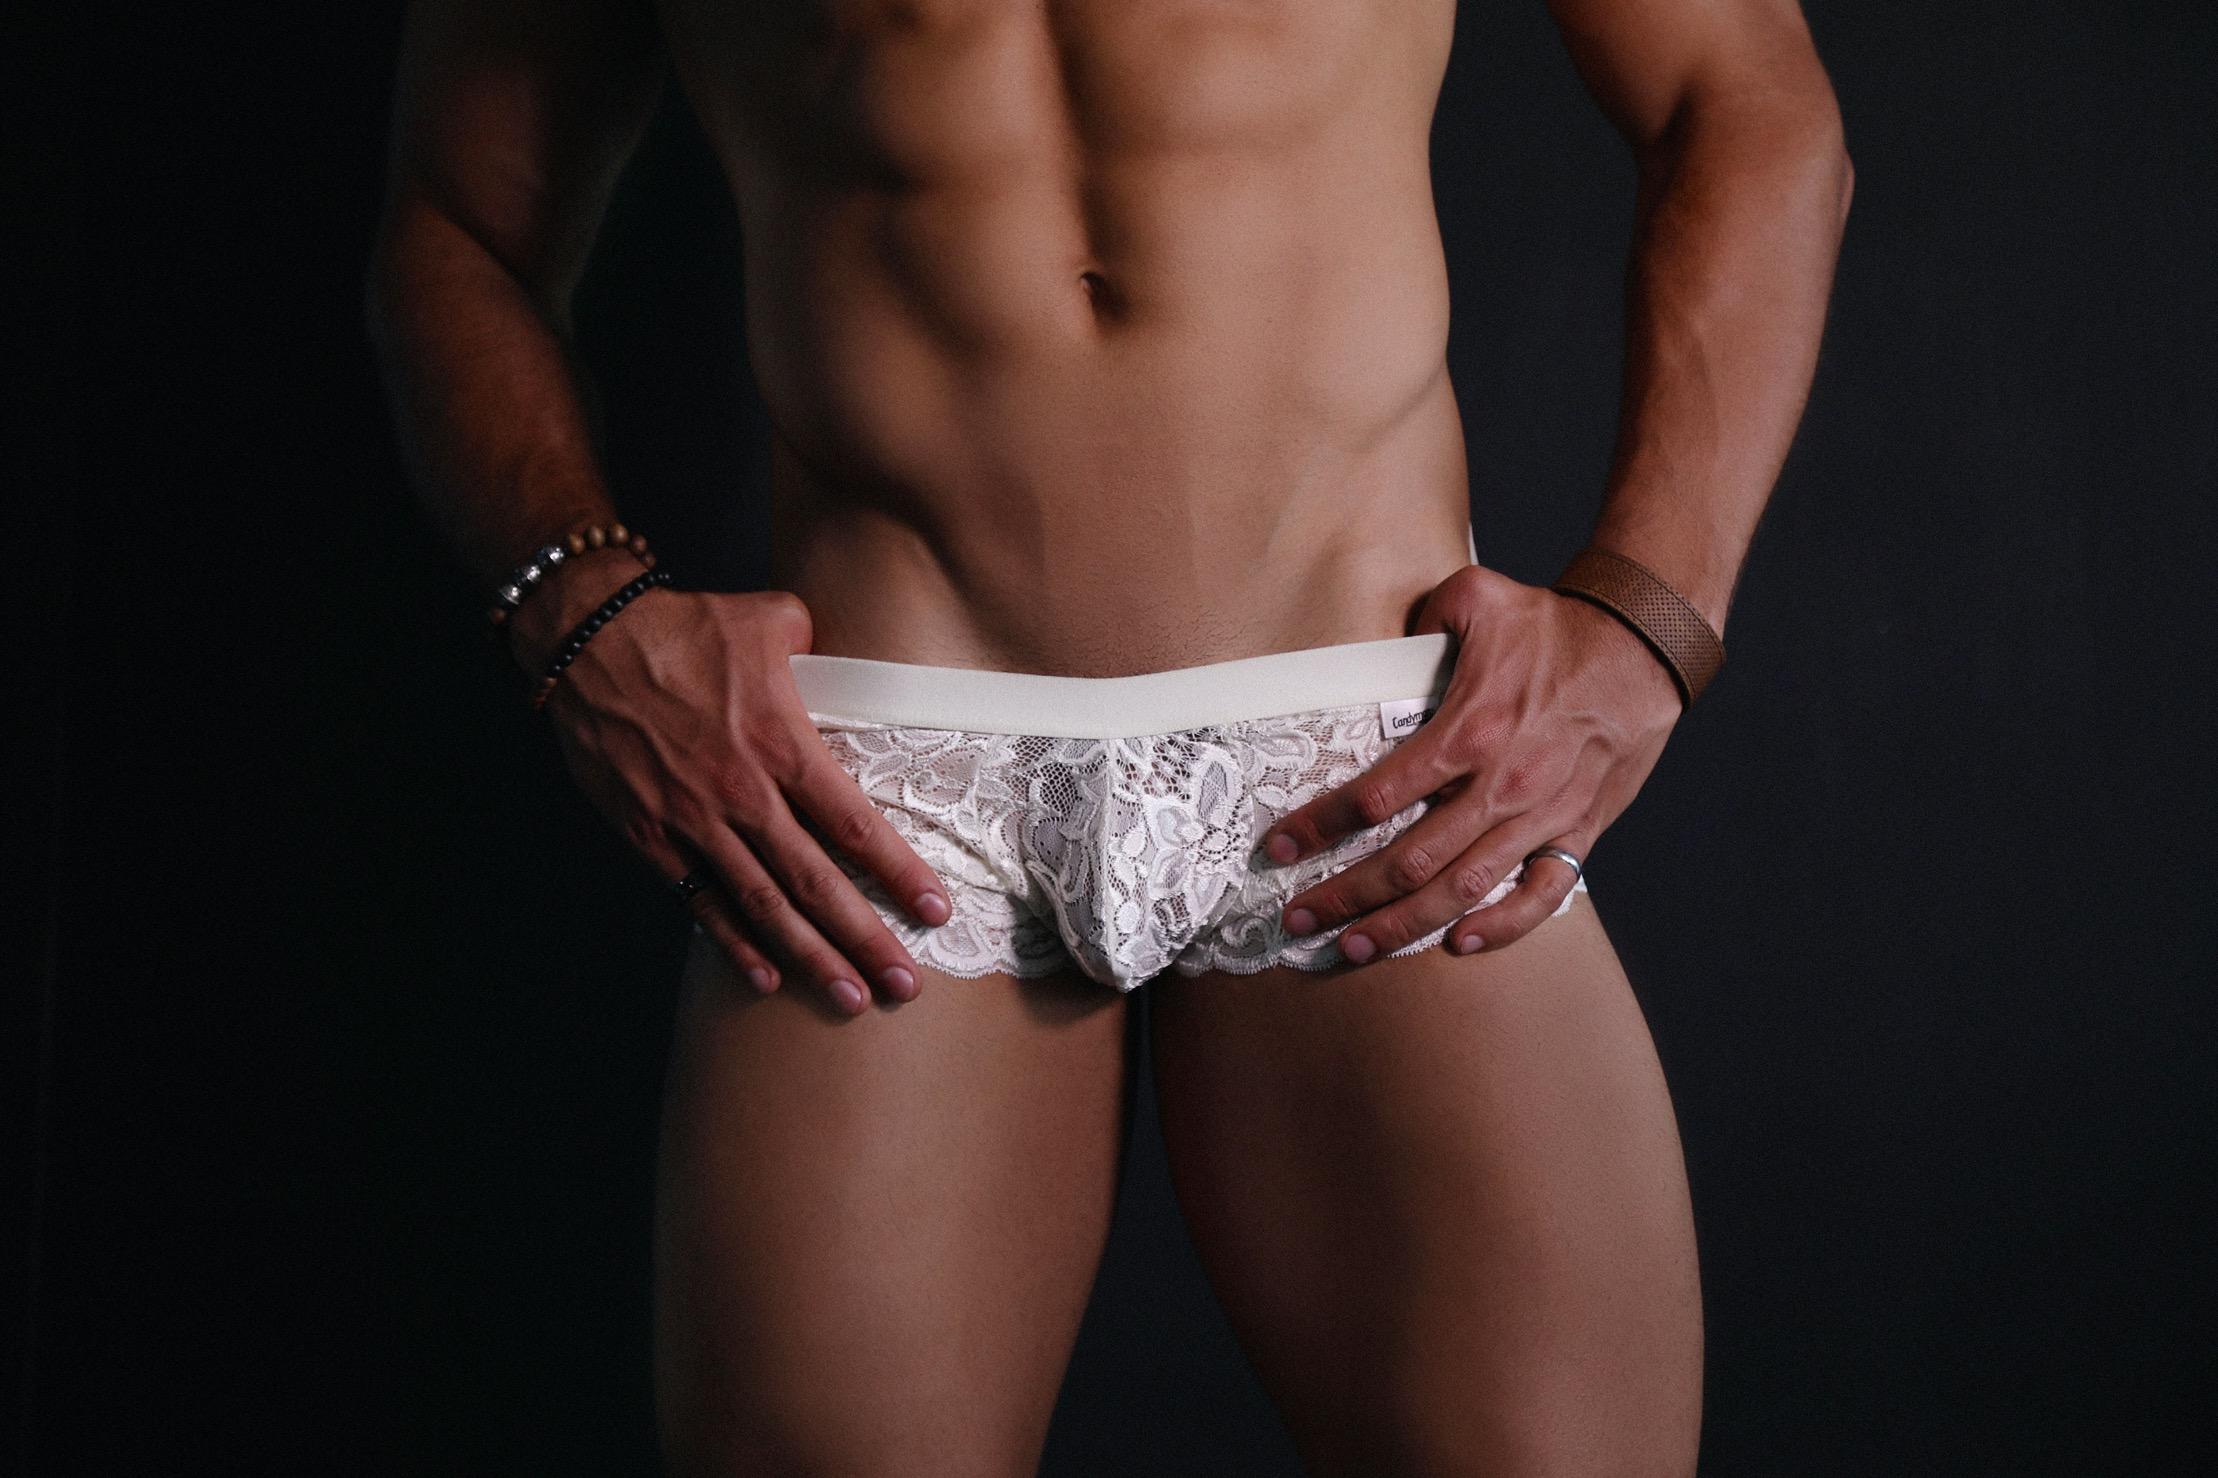 Candyman underwear